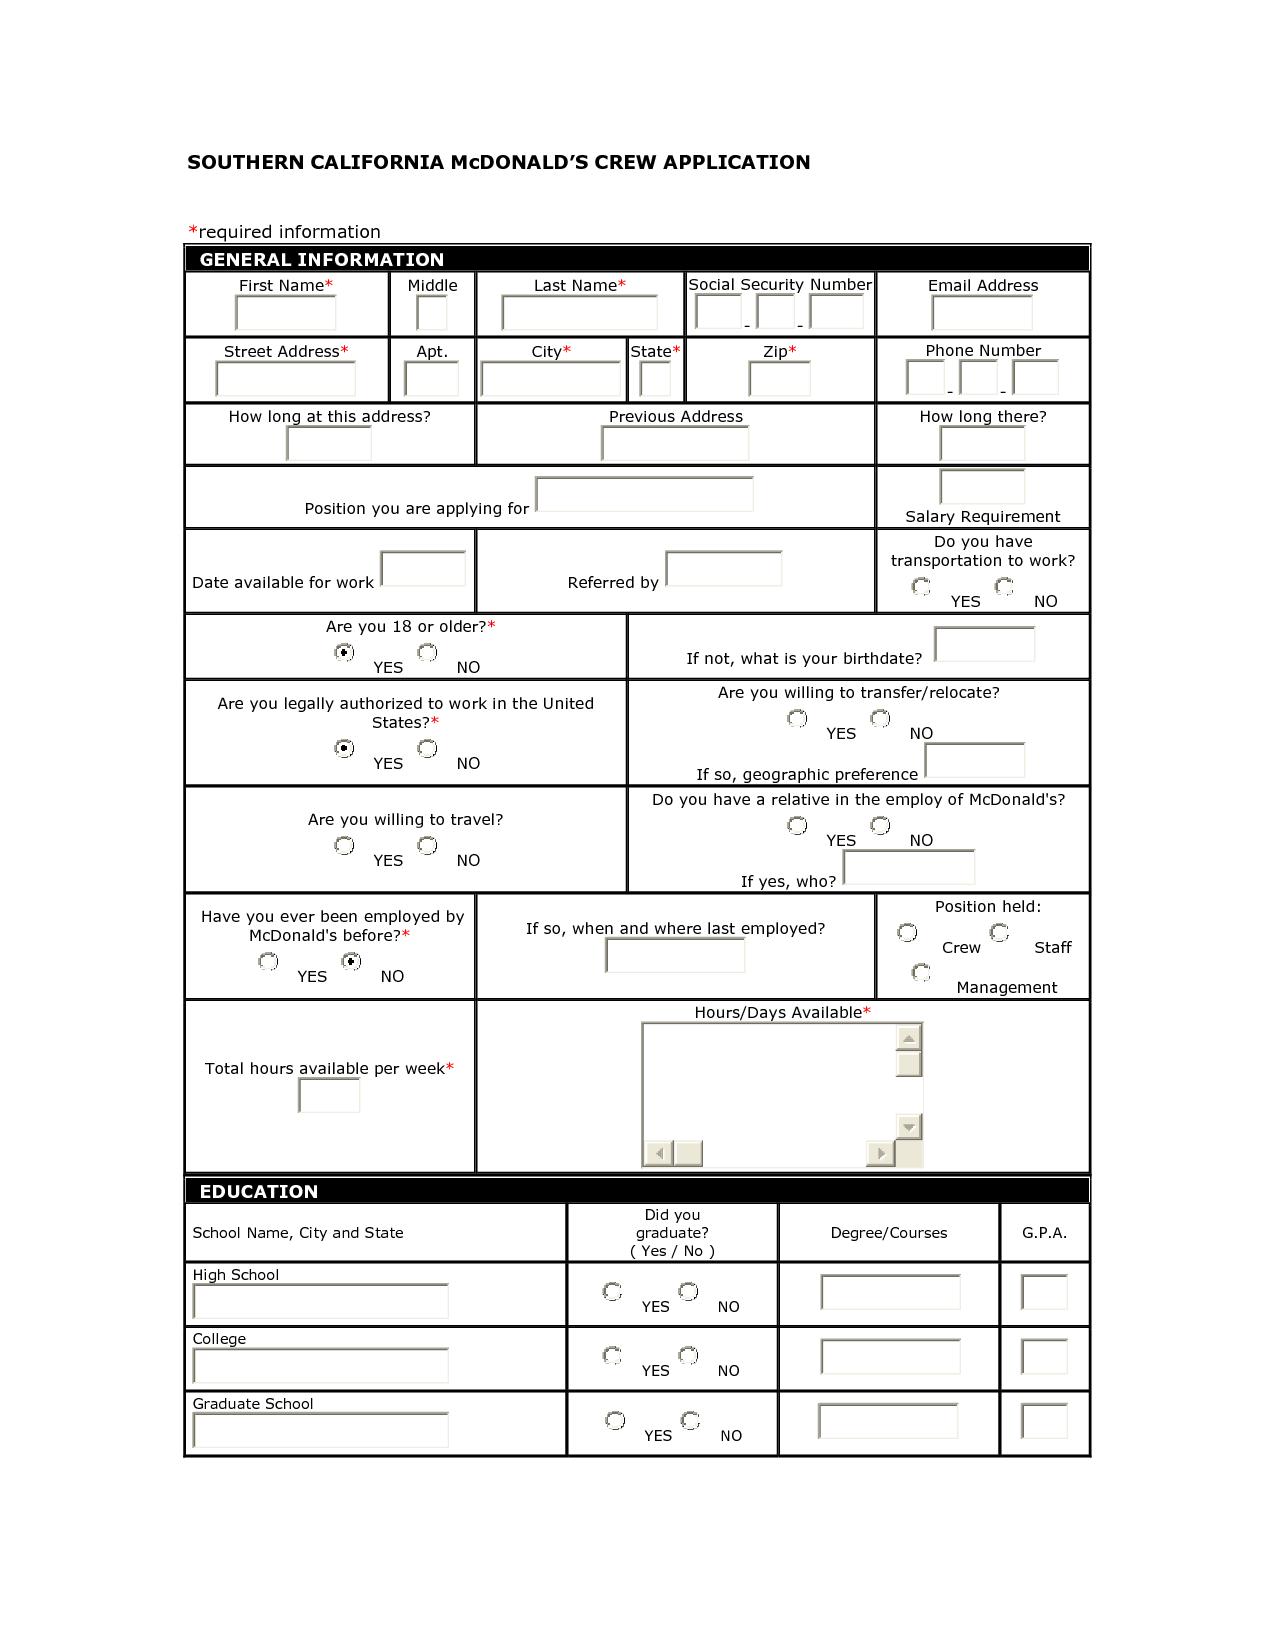 McDonalds Job Application Form | McDonalds Application | SLP stuff ...